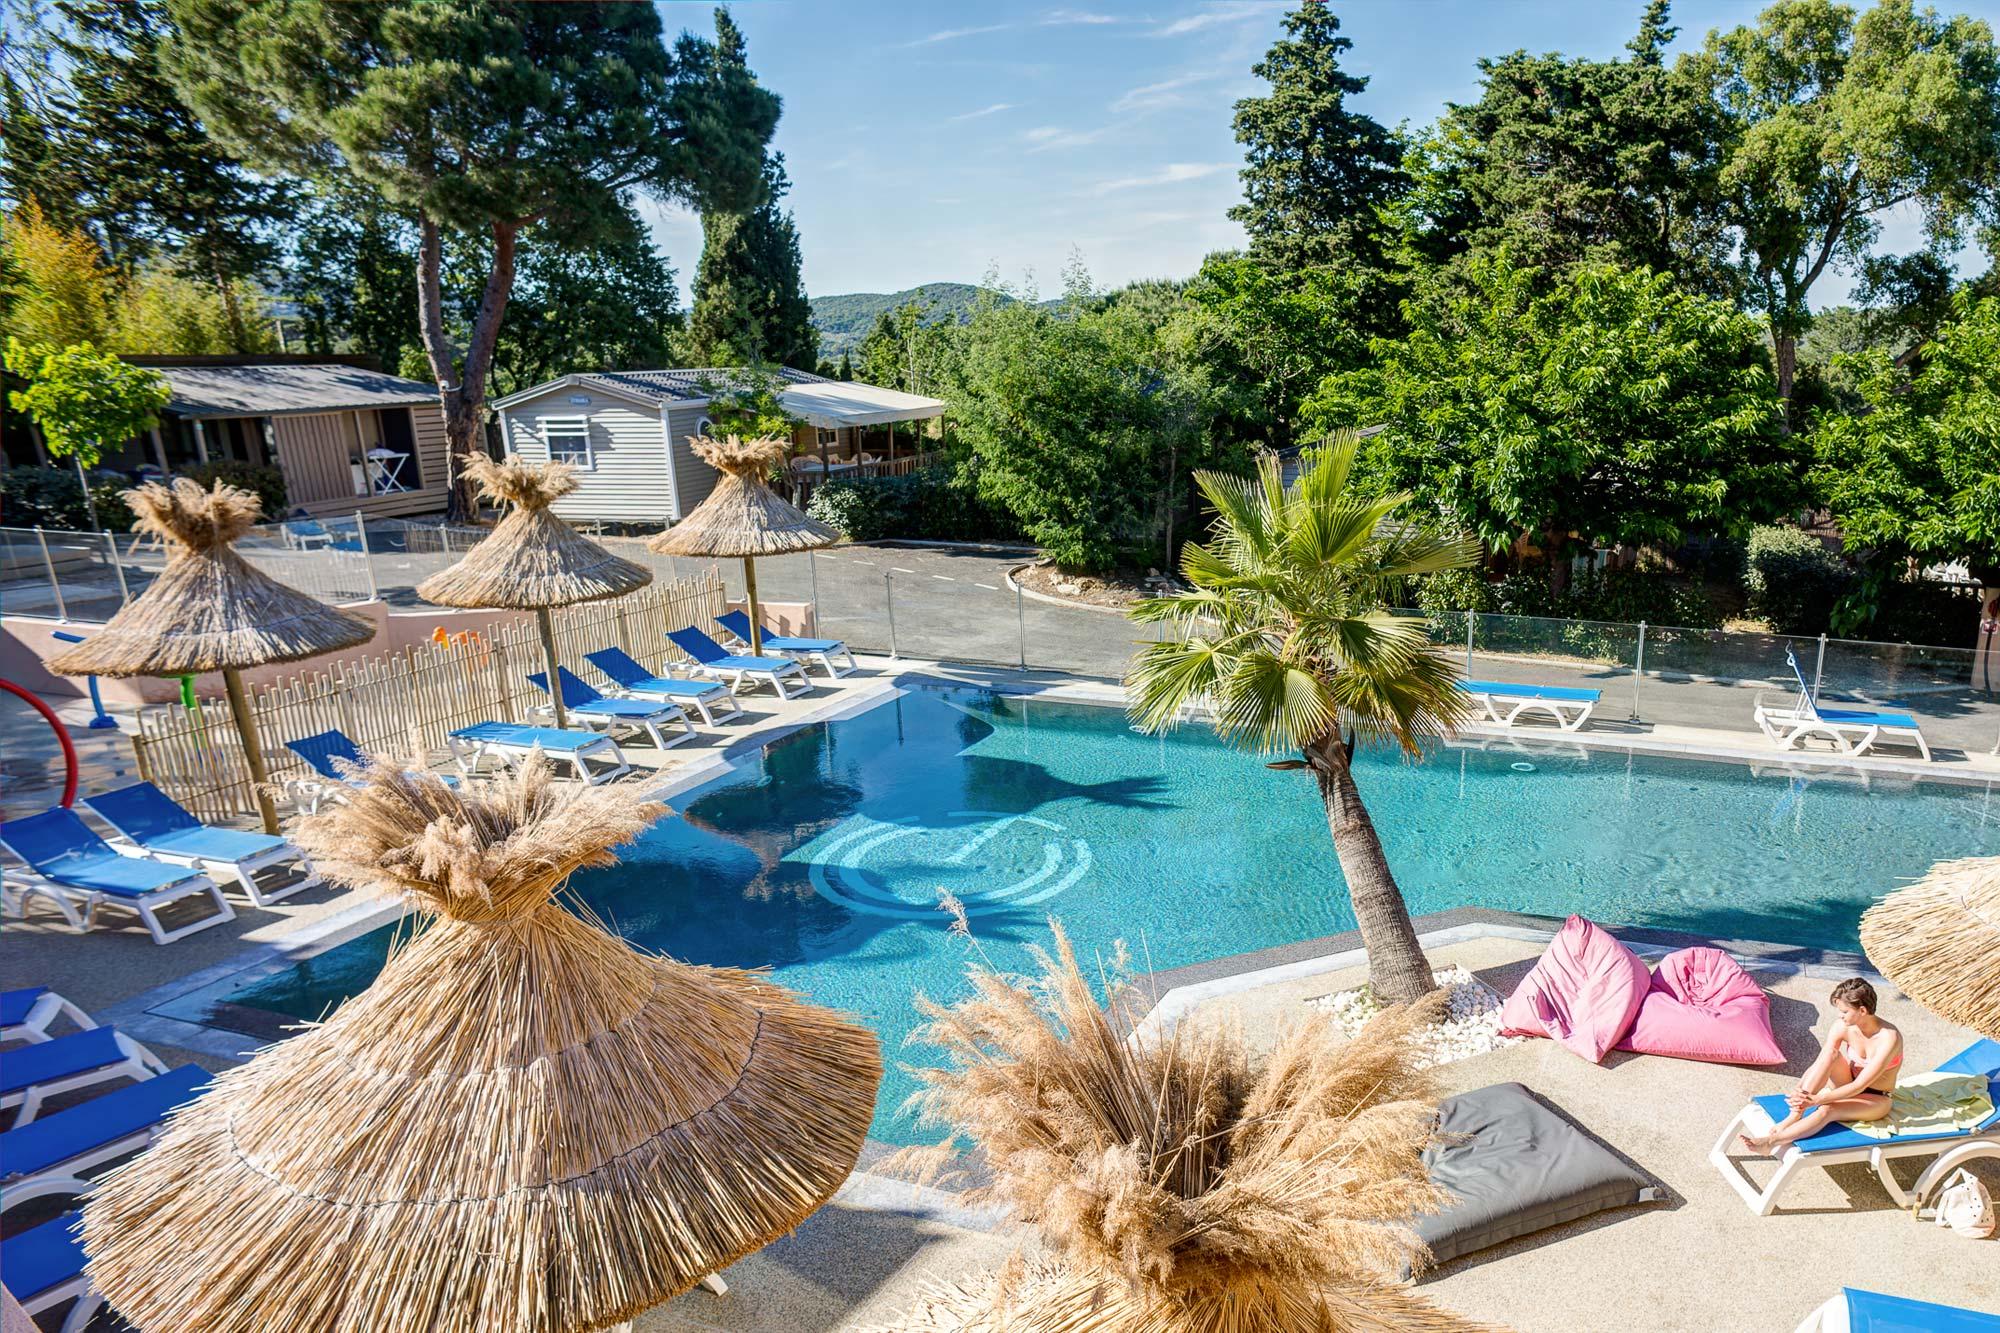 Camping ramatuelle cap taillat 4 toiles saint tropez for Camping 5 etoiles var bord de mer avec piscine